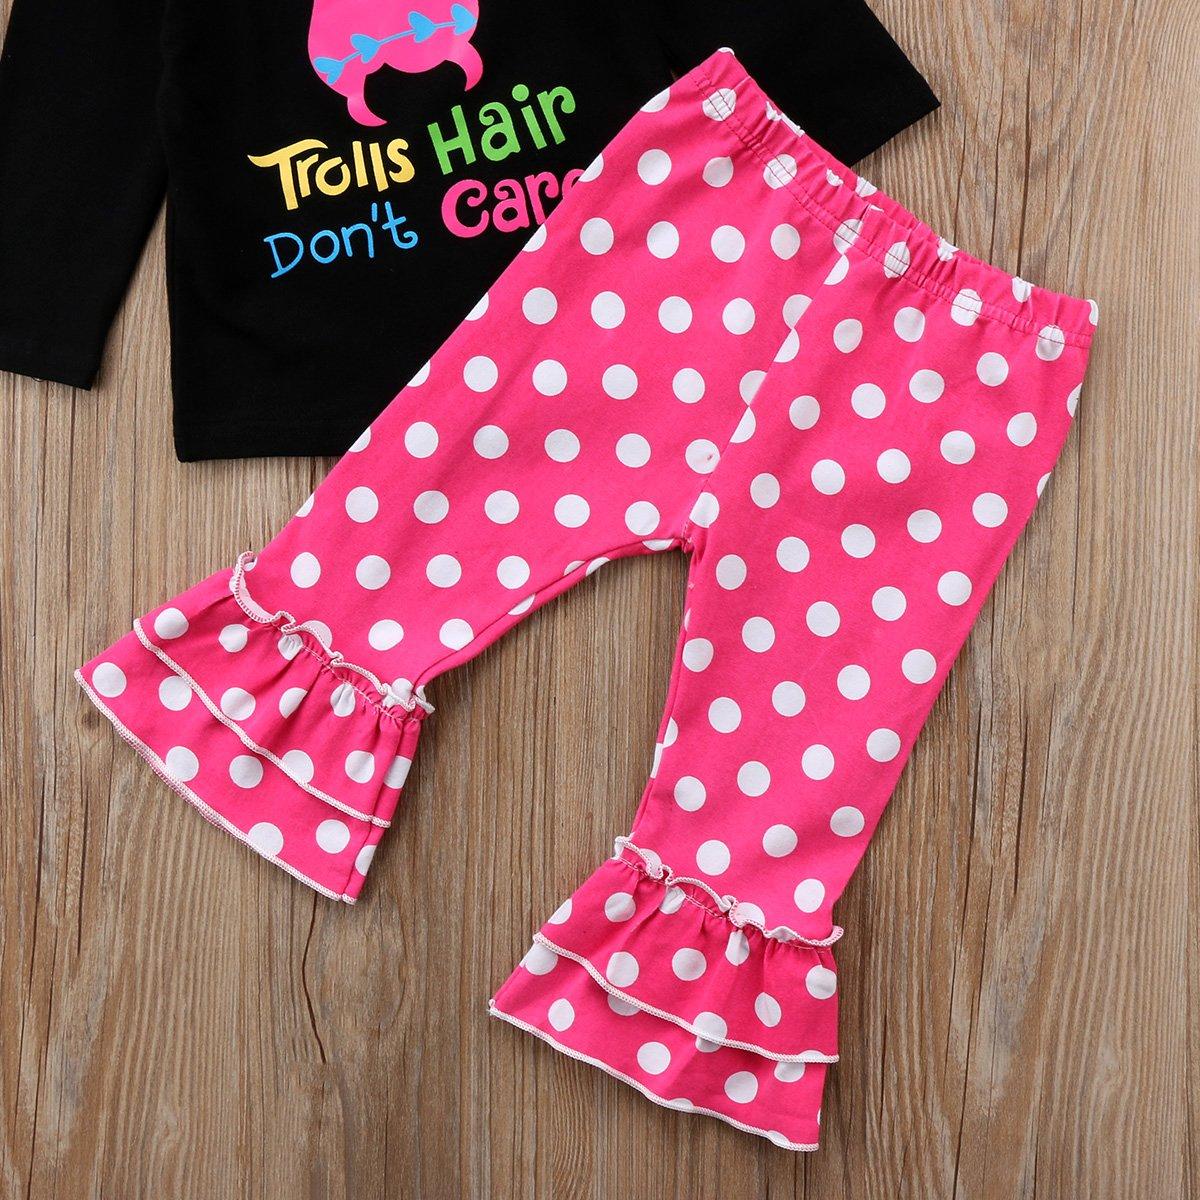 Annvivi Little Girl 2Pcs Long Sleeve Trolls Hair Dont Care Letter T-Shirt Ruffle Capri Pants Outfits